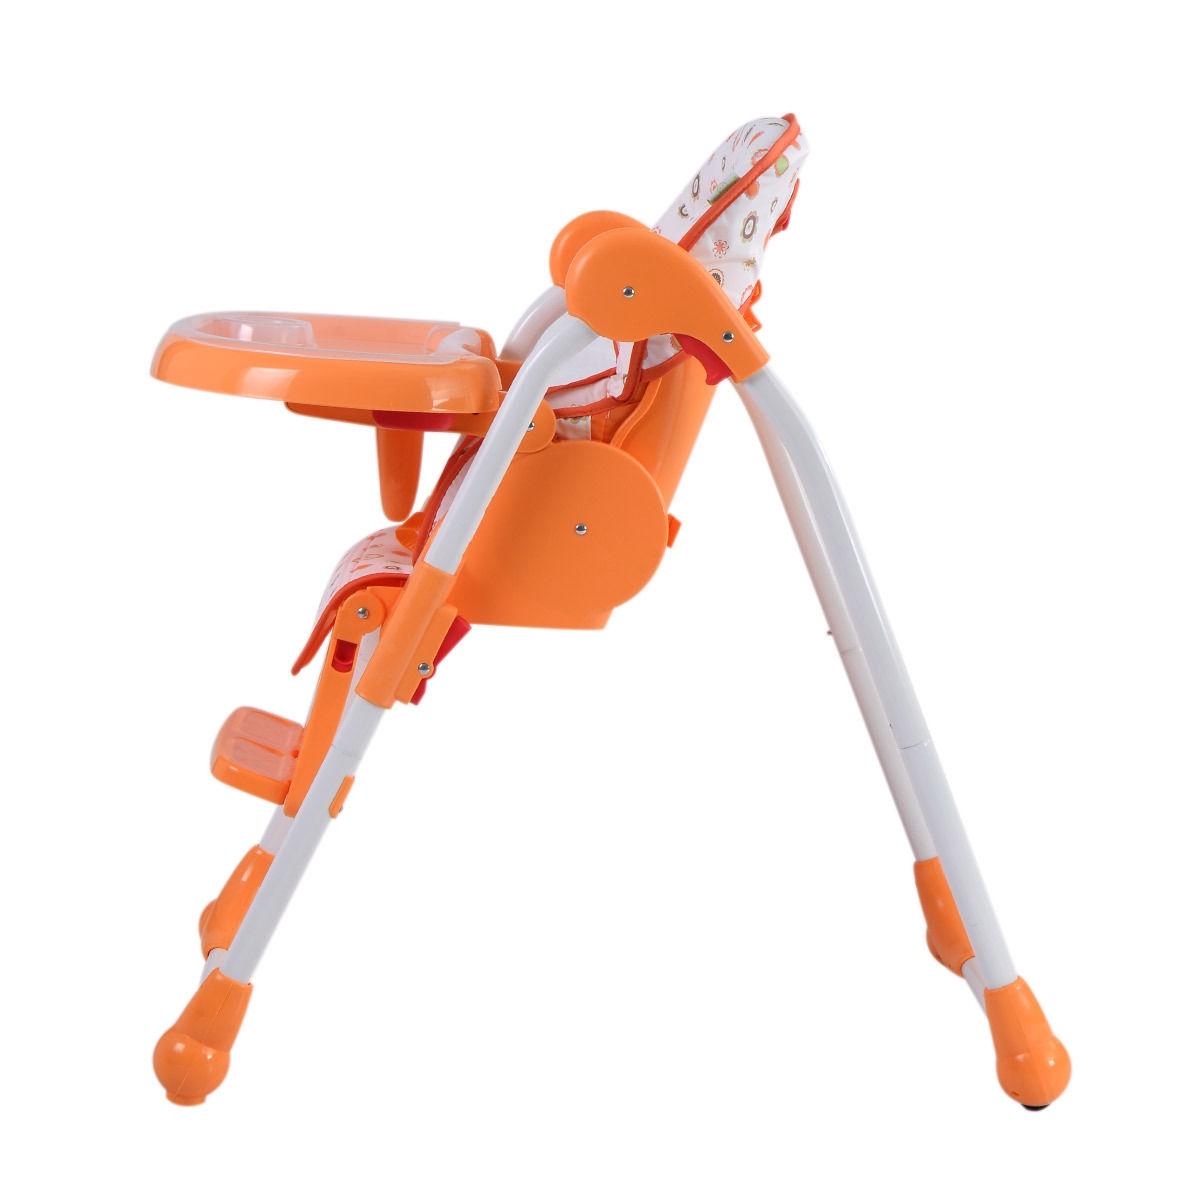 Adjustable Baby High Chair Infant Toddler Feeding Booster Seat Folding-orange